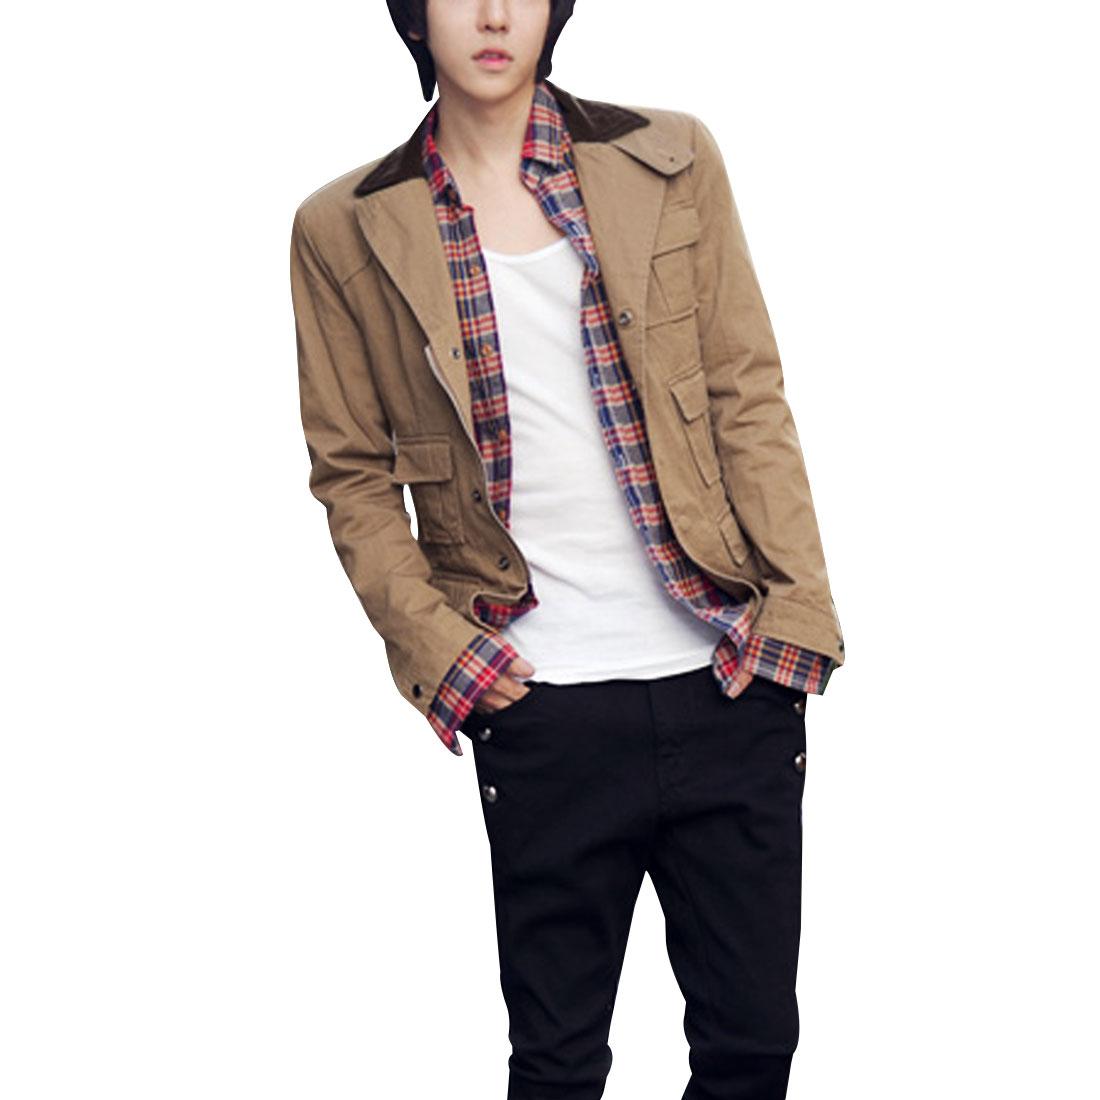 Man-Single-Breasted-Five-Pockets-Design-Front-Jacket-Khaki-M